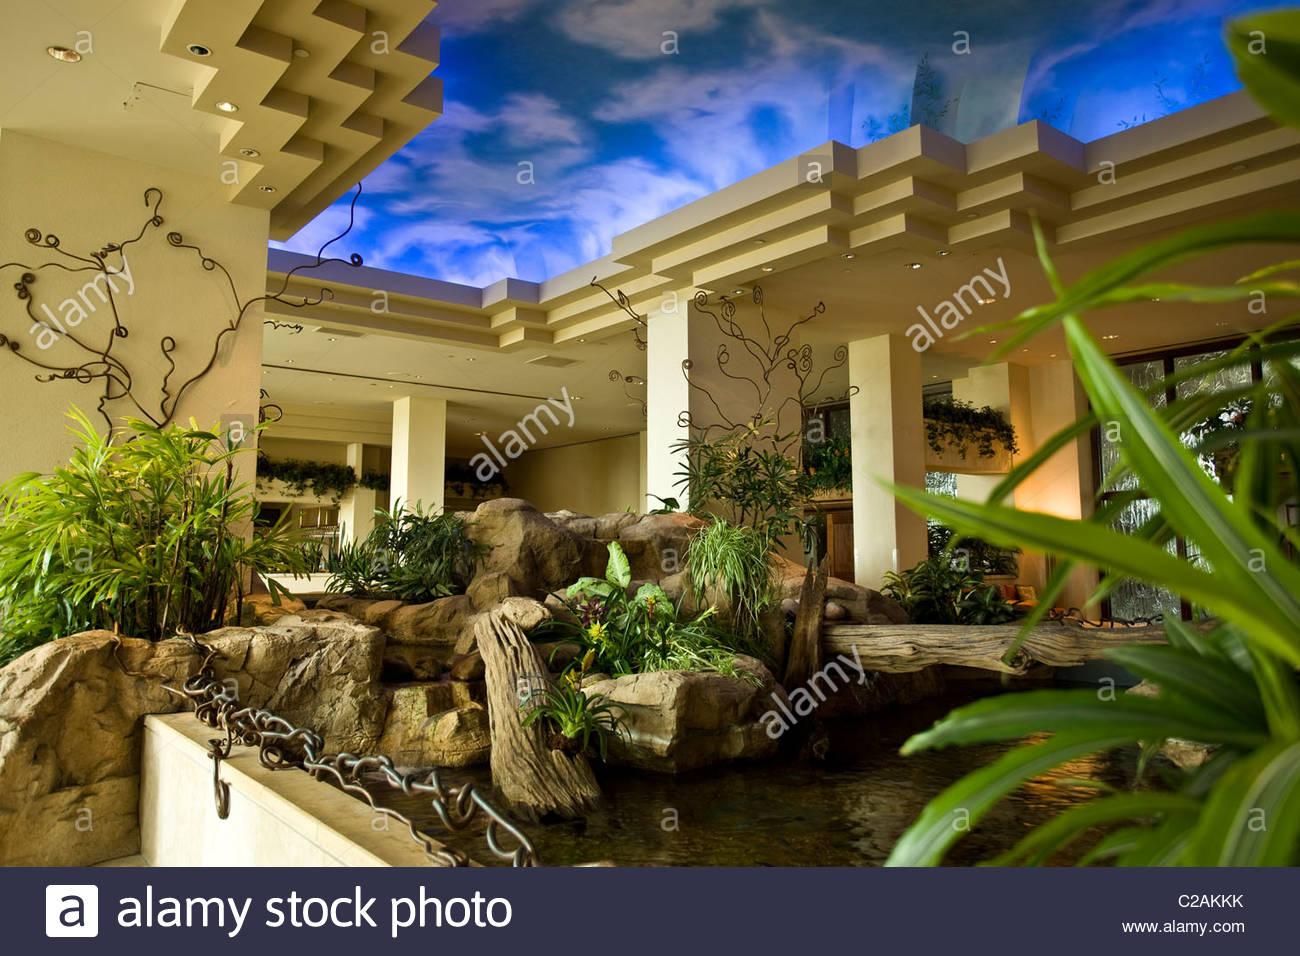 Moody Gardens Hotel Lobby Resort, Galveston, Texas.